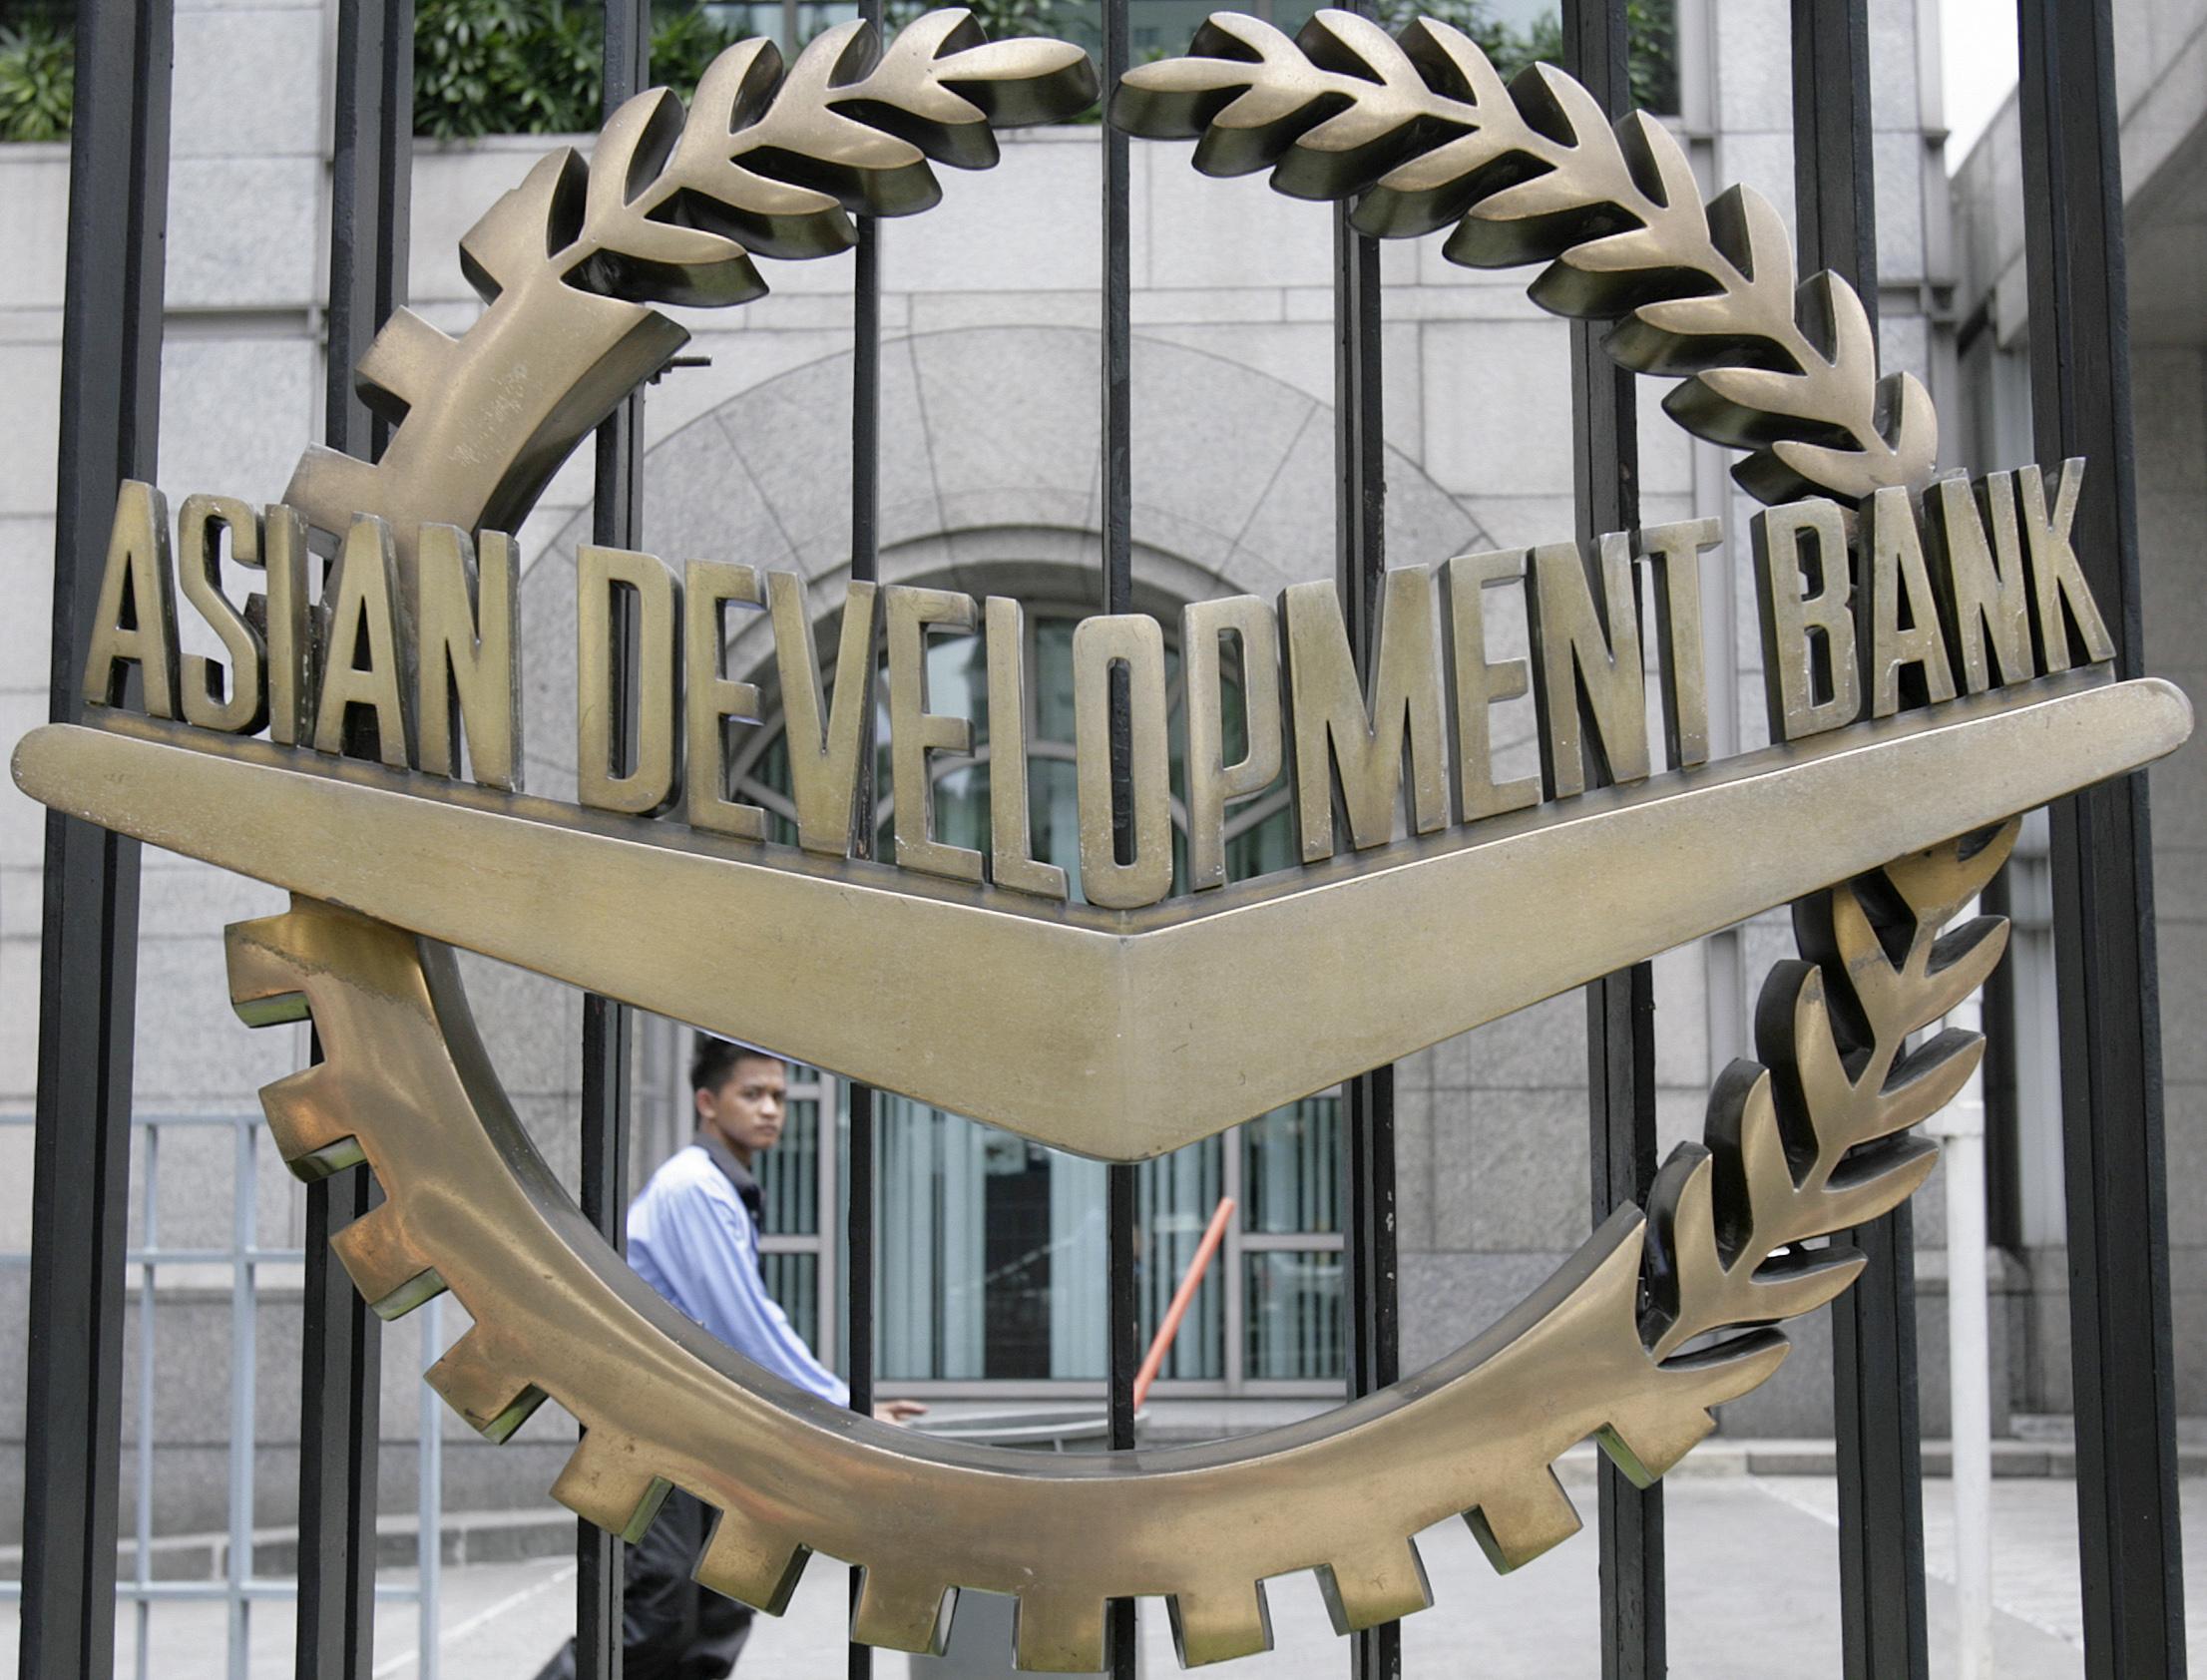 File photo: A worker walks past inside the Asian Development Bank (ADB) headquarters in Manila June 17, 2009. REUTERS/Cheryl Ravelo